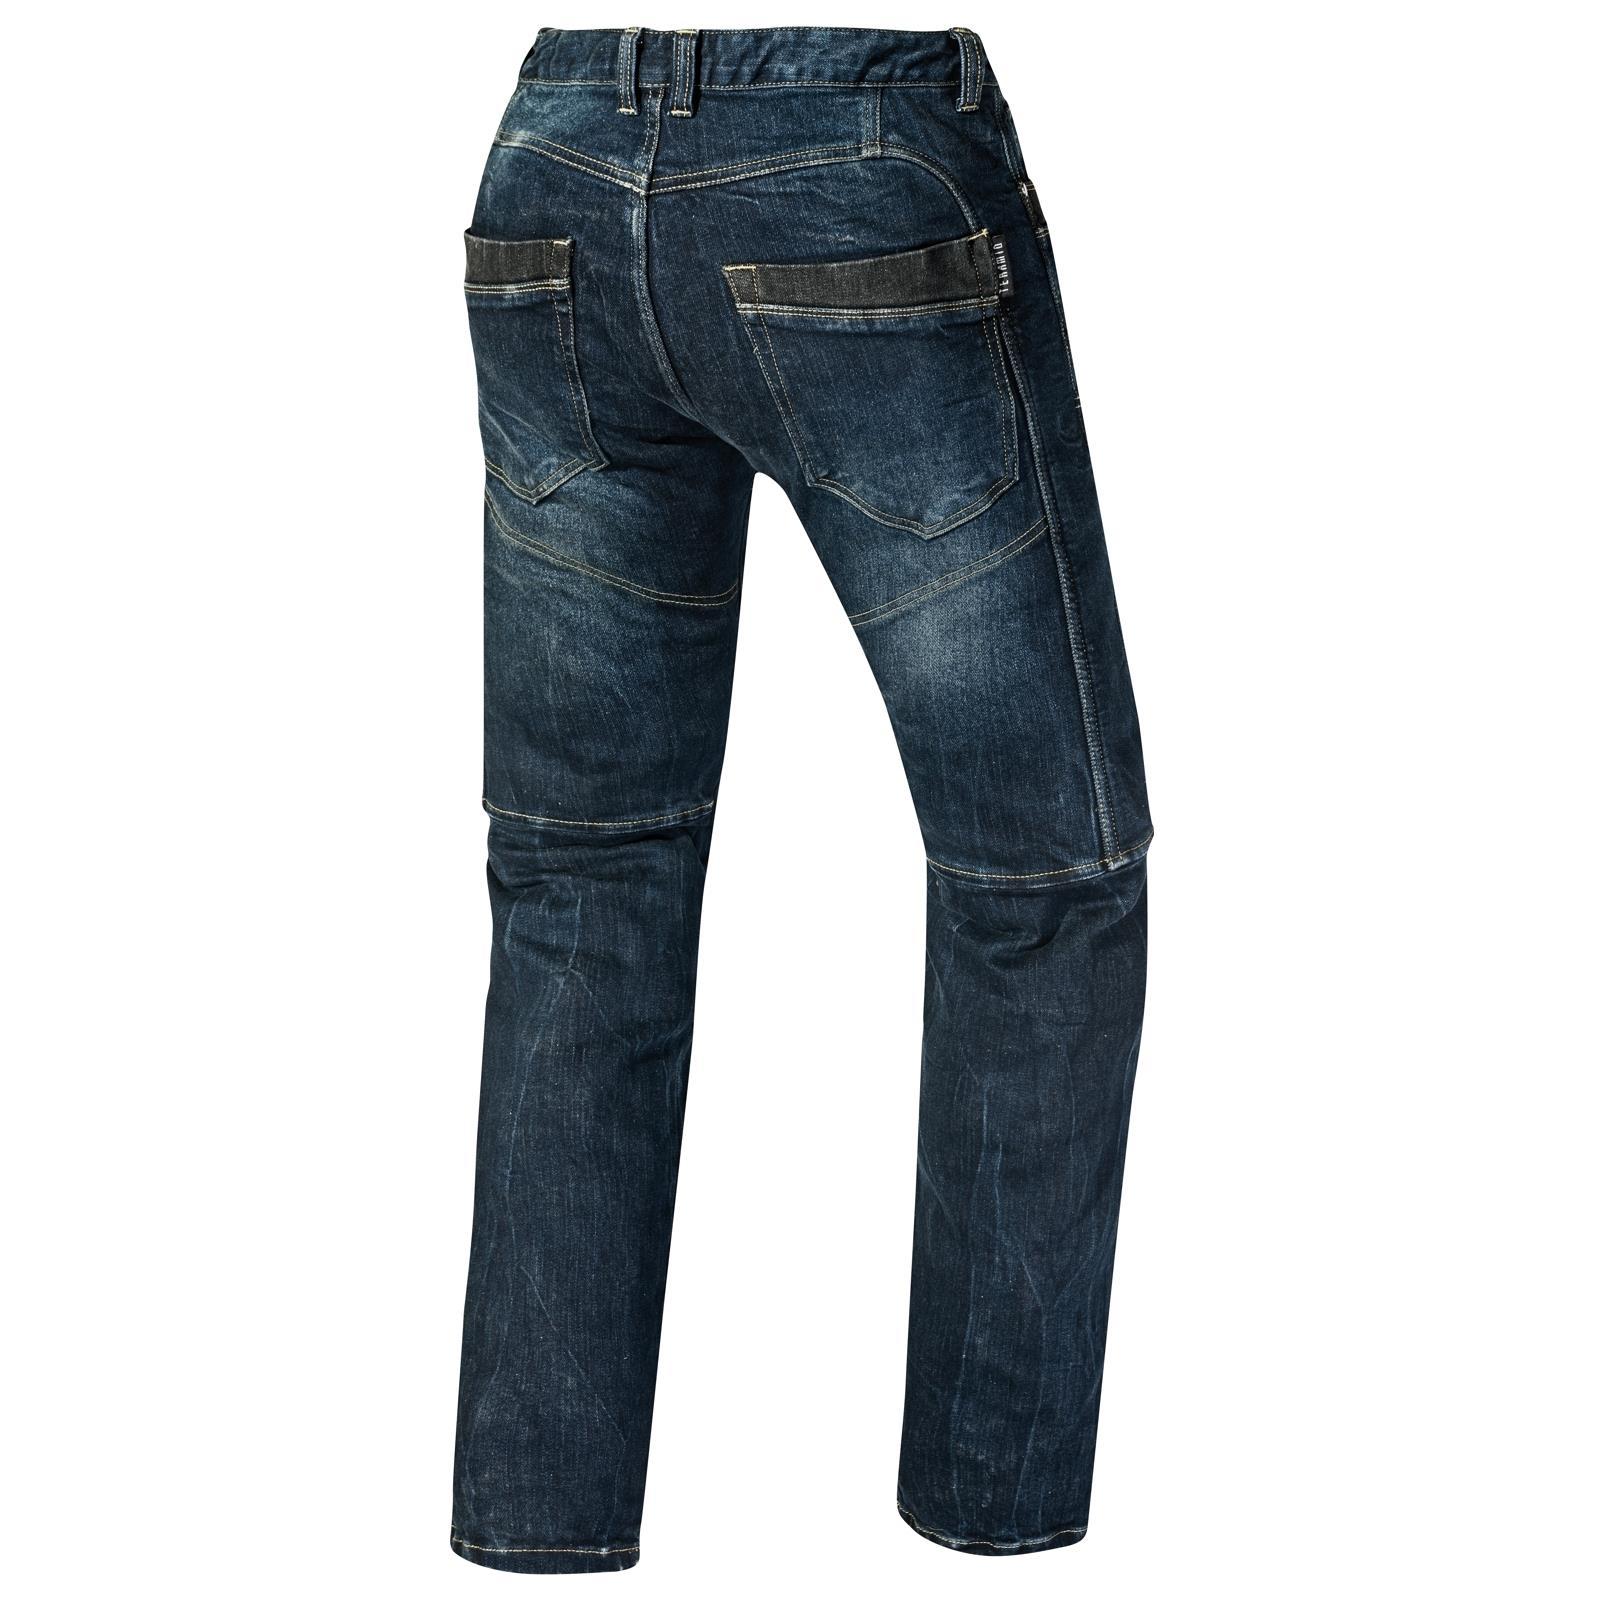 germot jump motorrad jeans herren blau l34 style hohe. Black Bedroom Furniture Sets. Home Design Ideas